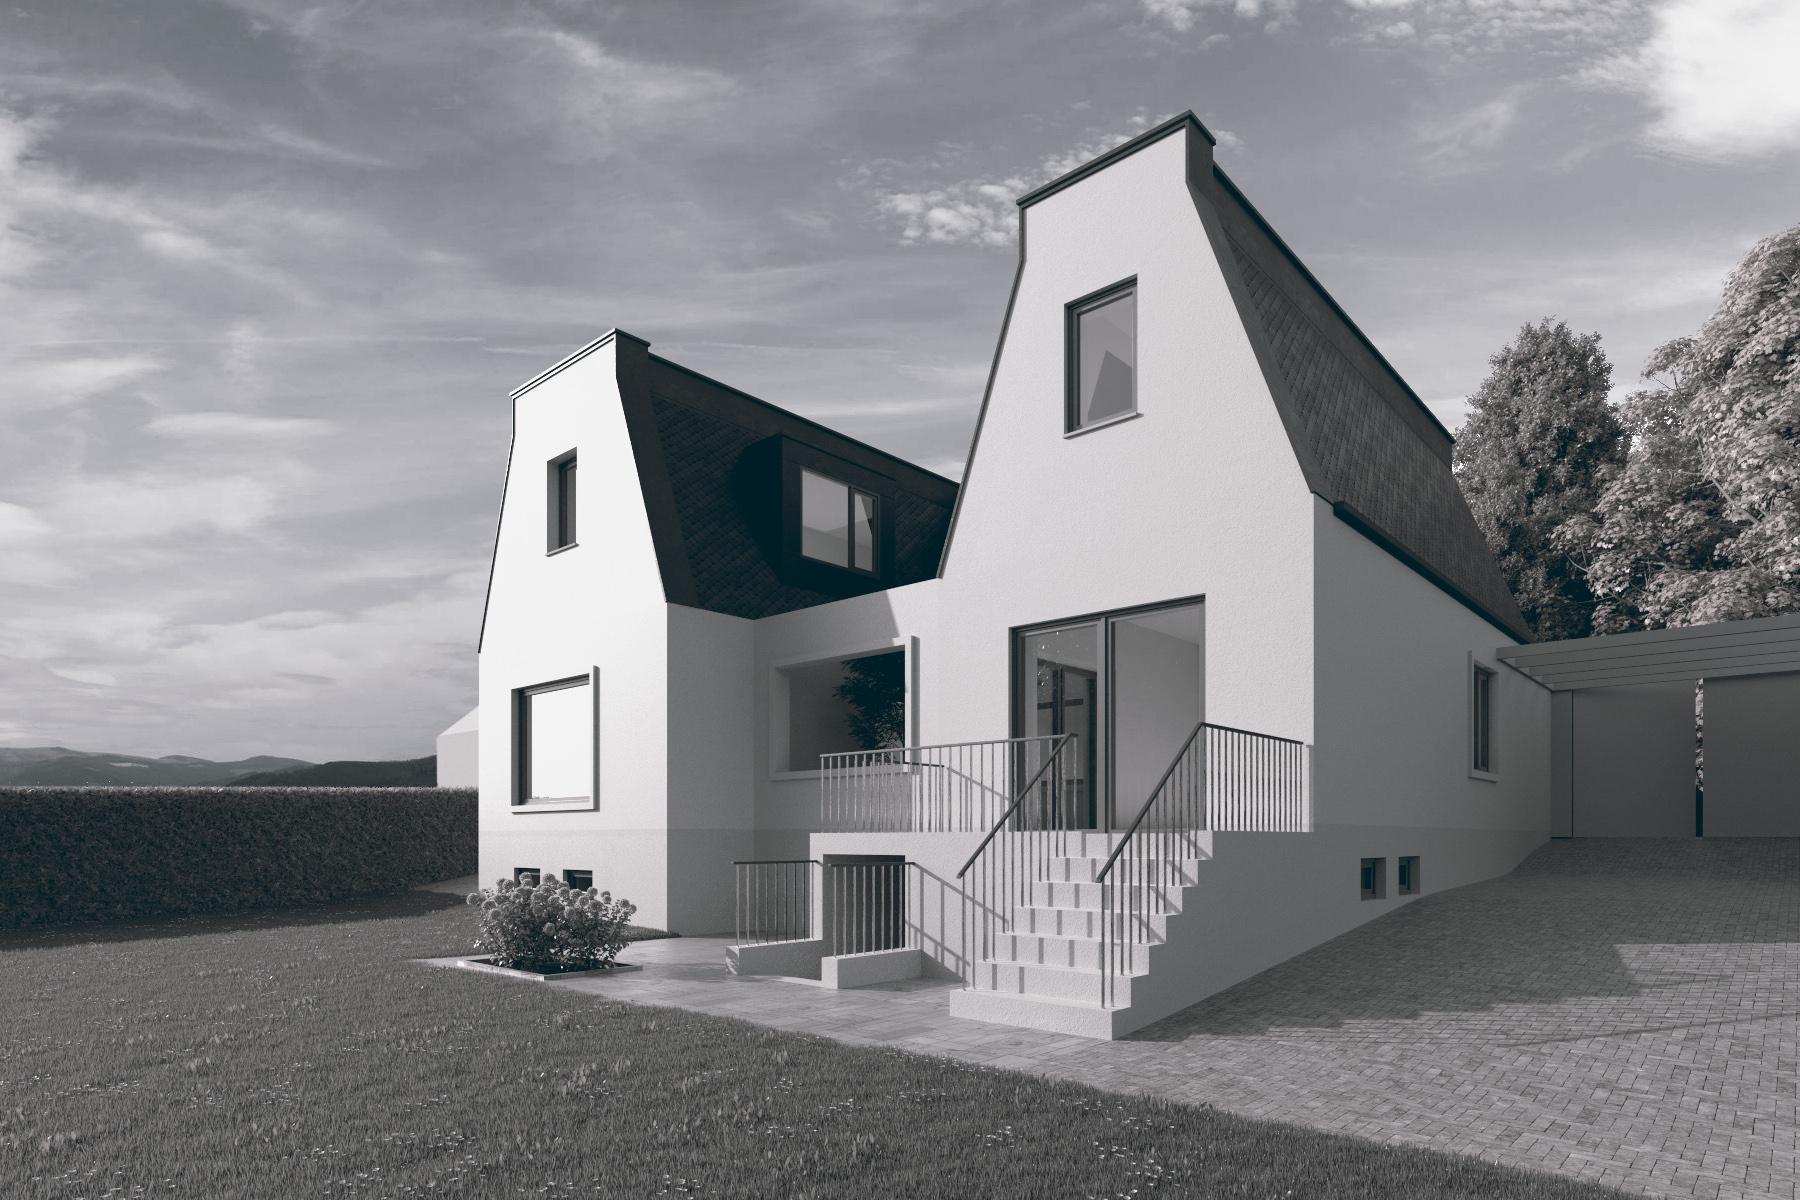 MIK Architektur: MIK Architektur